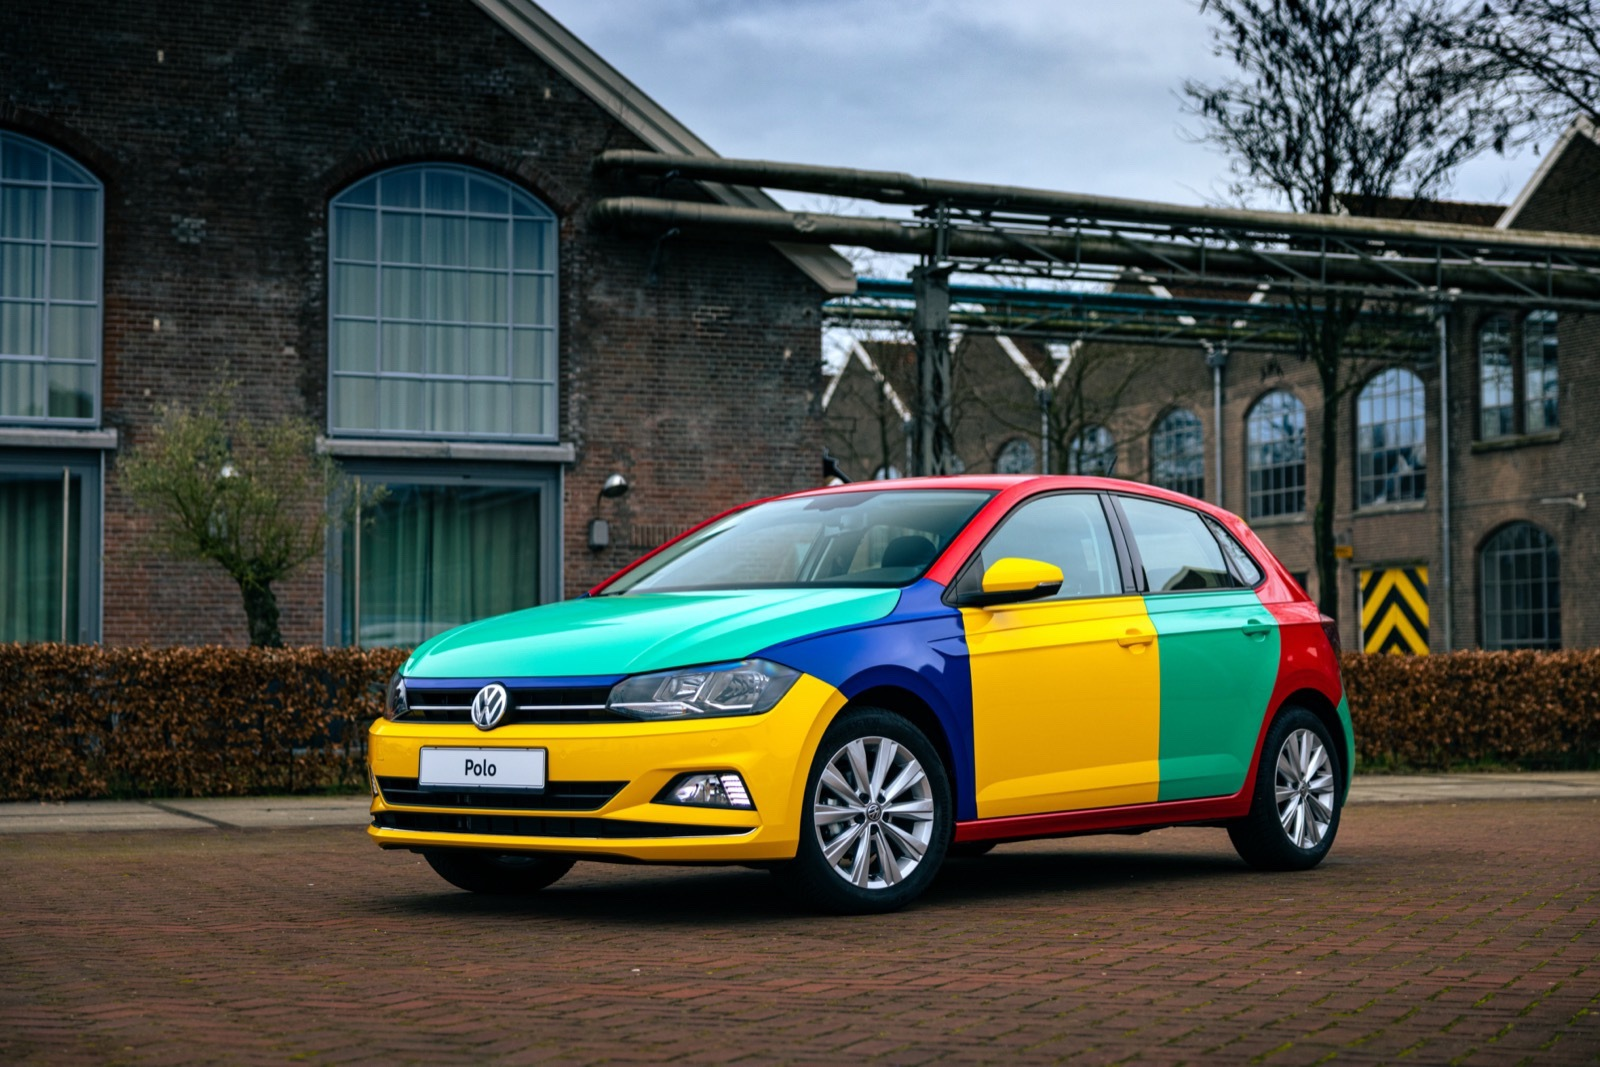 Volkswagen_Netherlands_modern_Polo_Harlekin_0016